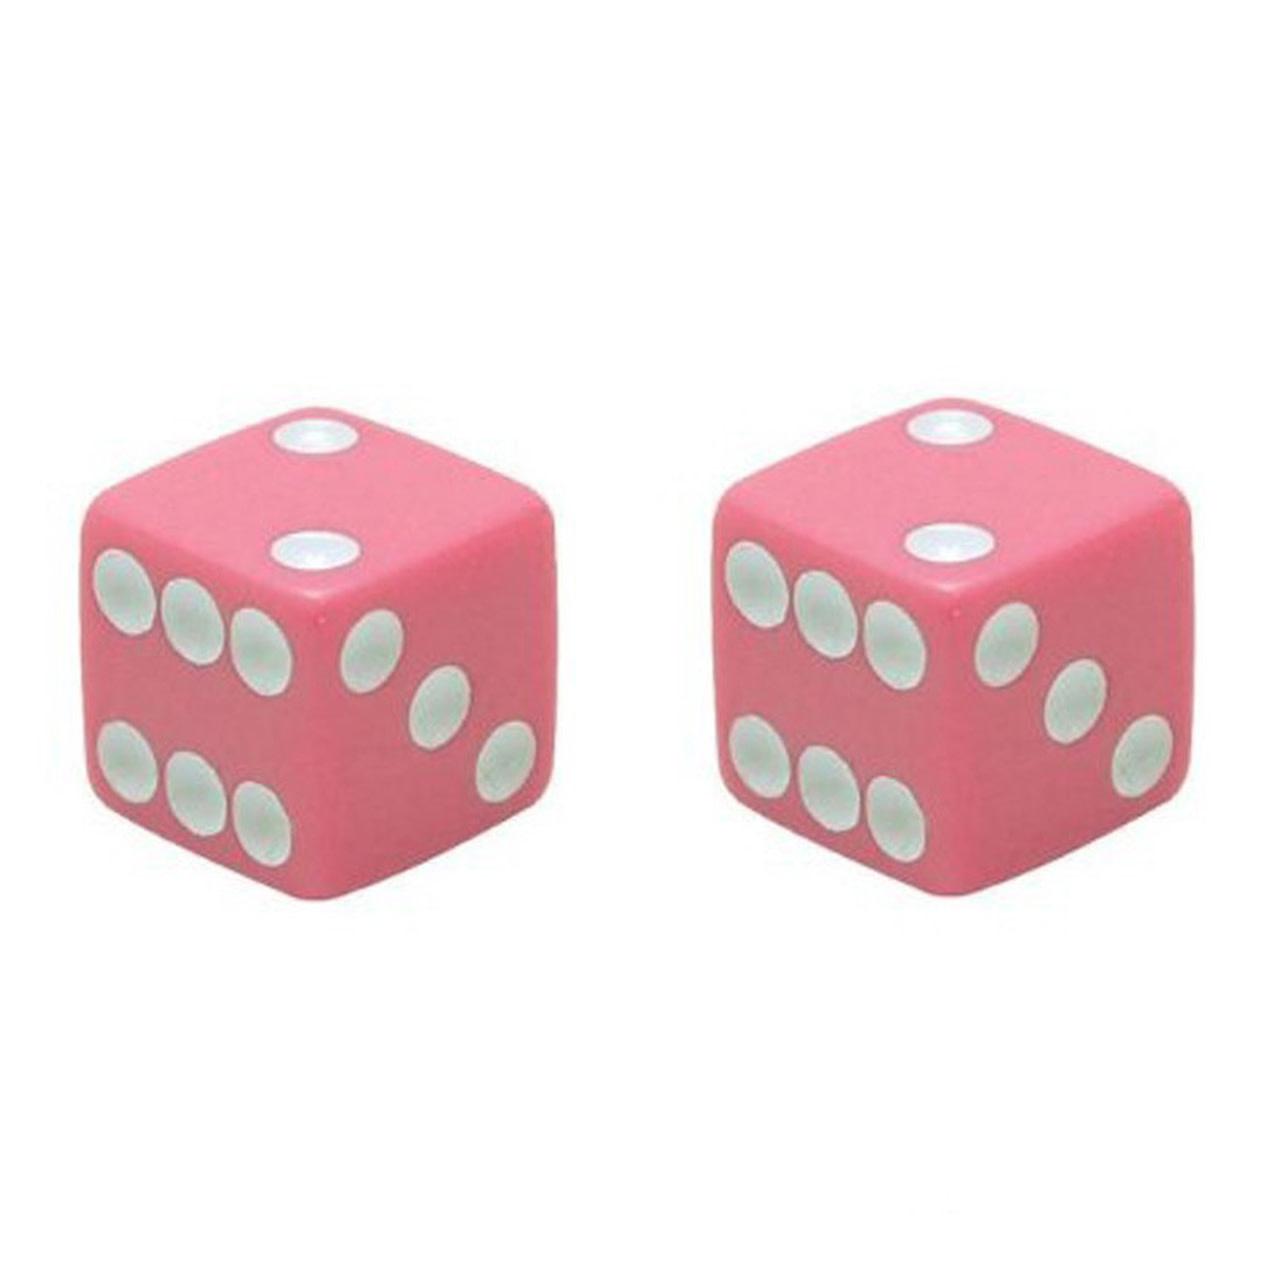 Trik Topz Valve Caps - Dice - Pink